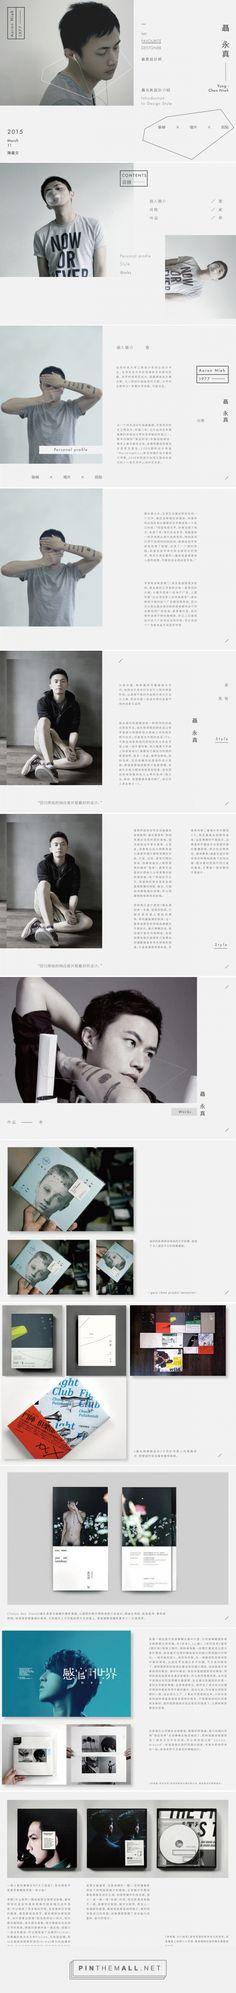 PPT / 聂永真 - 廣島Alvin Chen